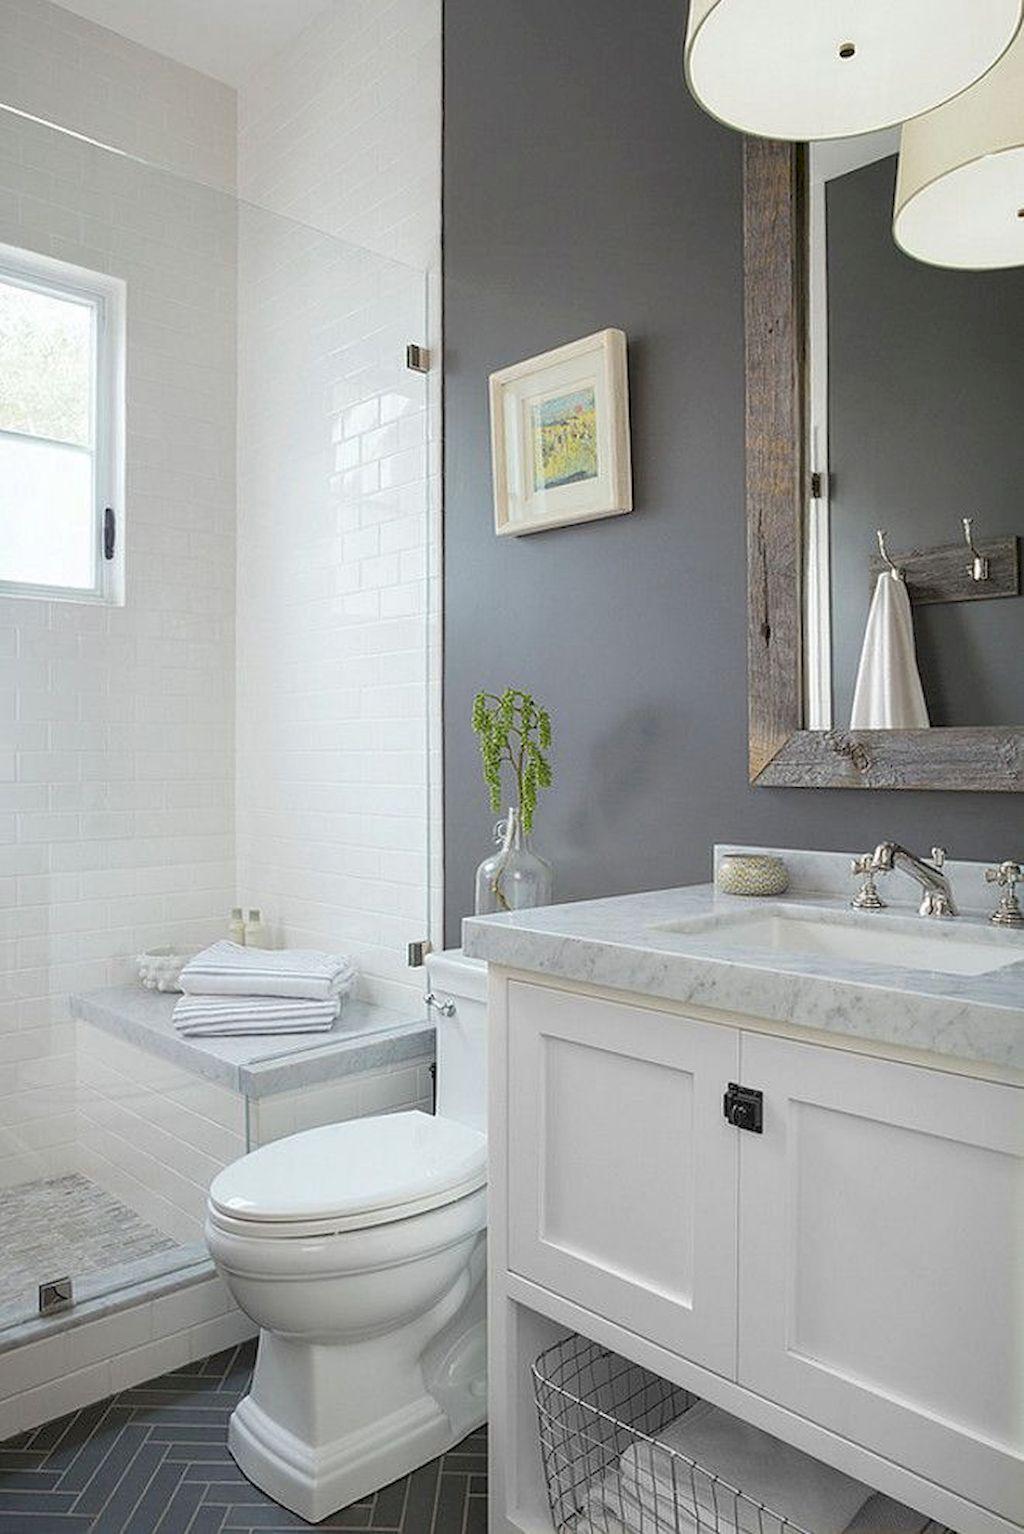 Comment Fabriquer Meuble Salle De Bain Beton Cellulaire ~ Fresh Small Master Bathroom Remodel Ideas On A Budget 8